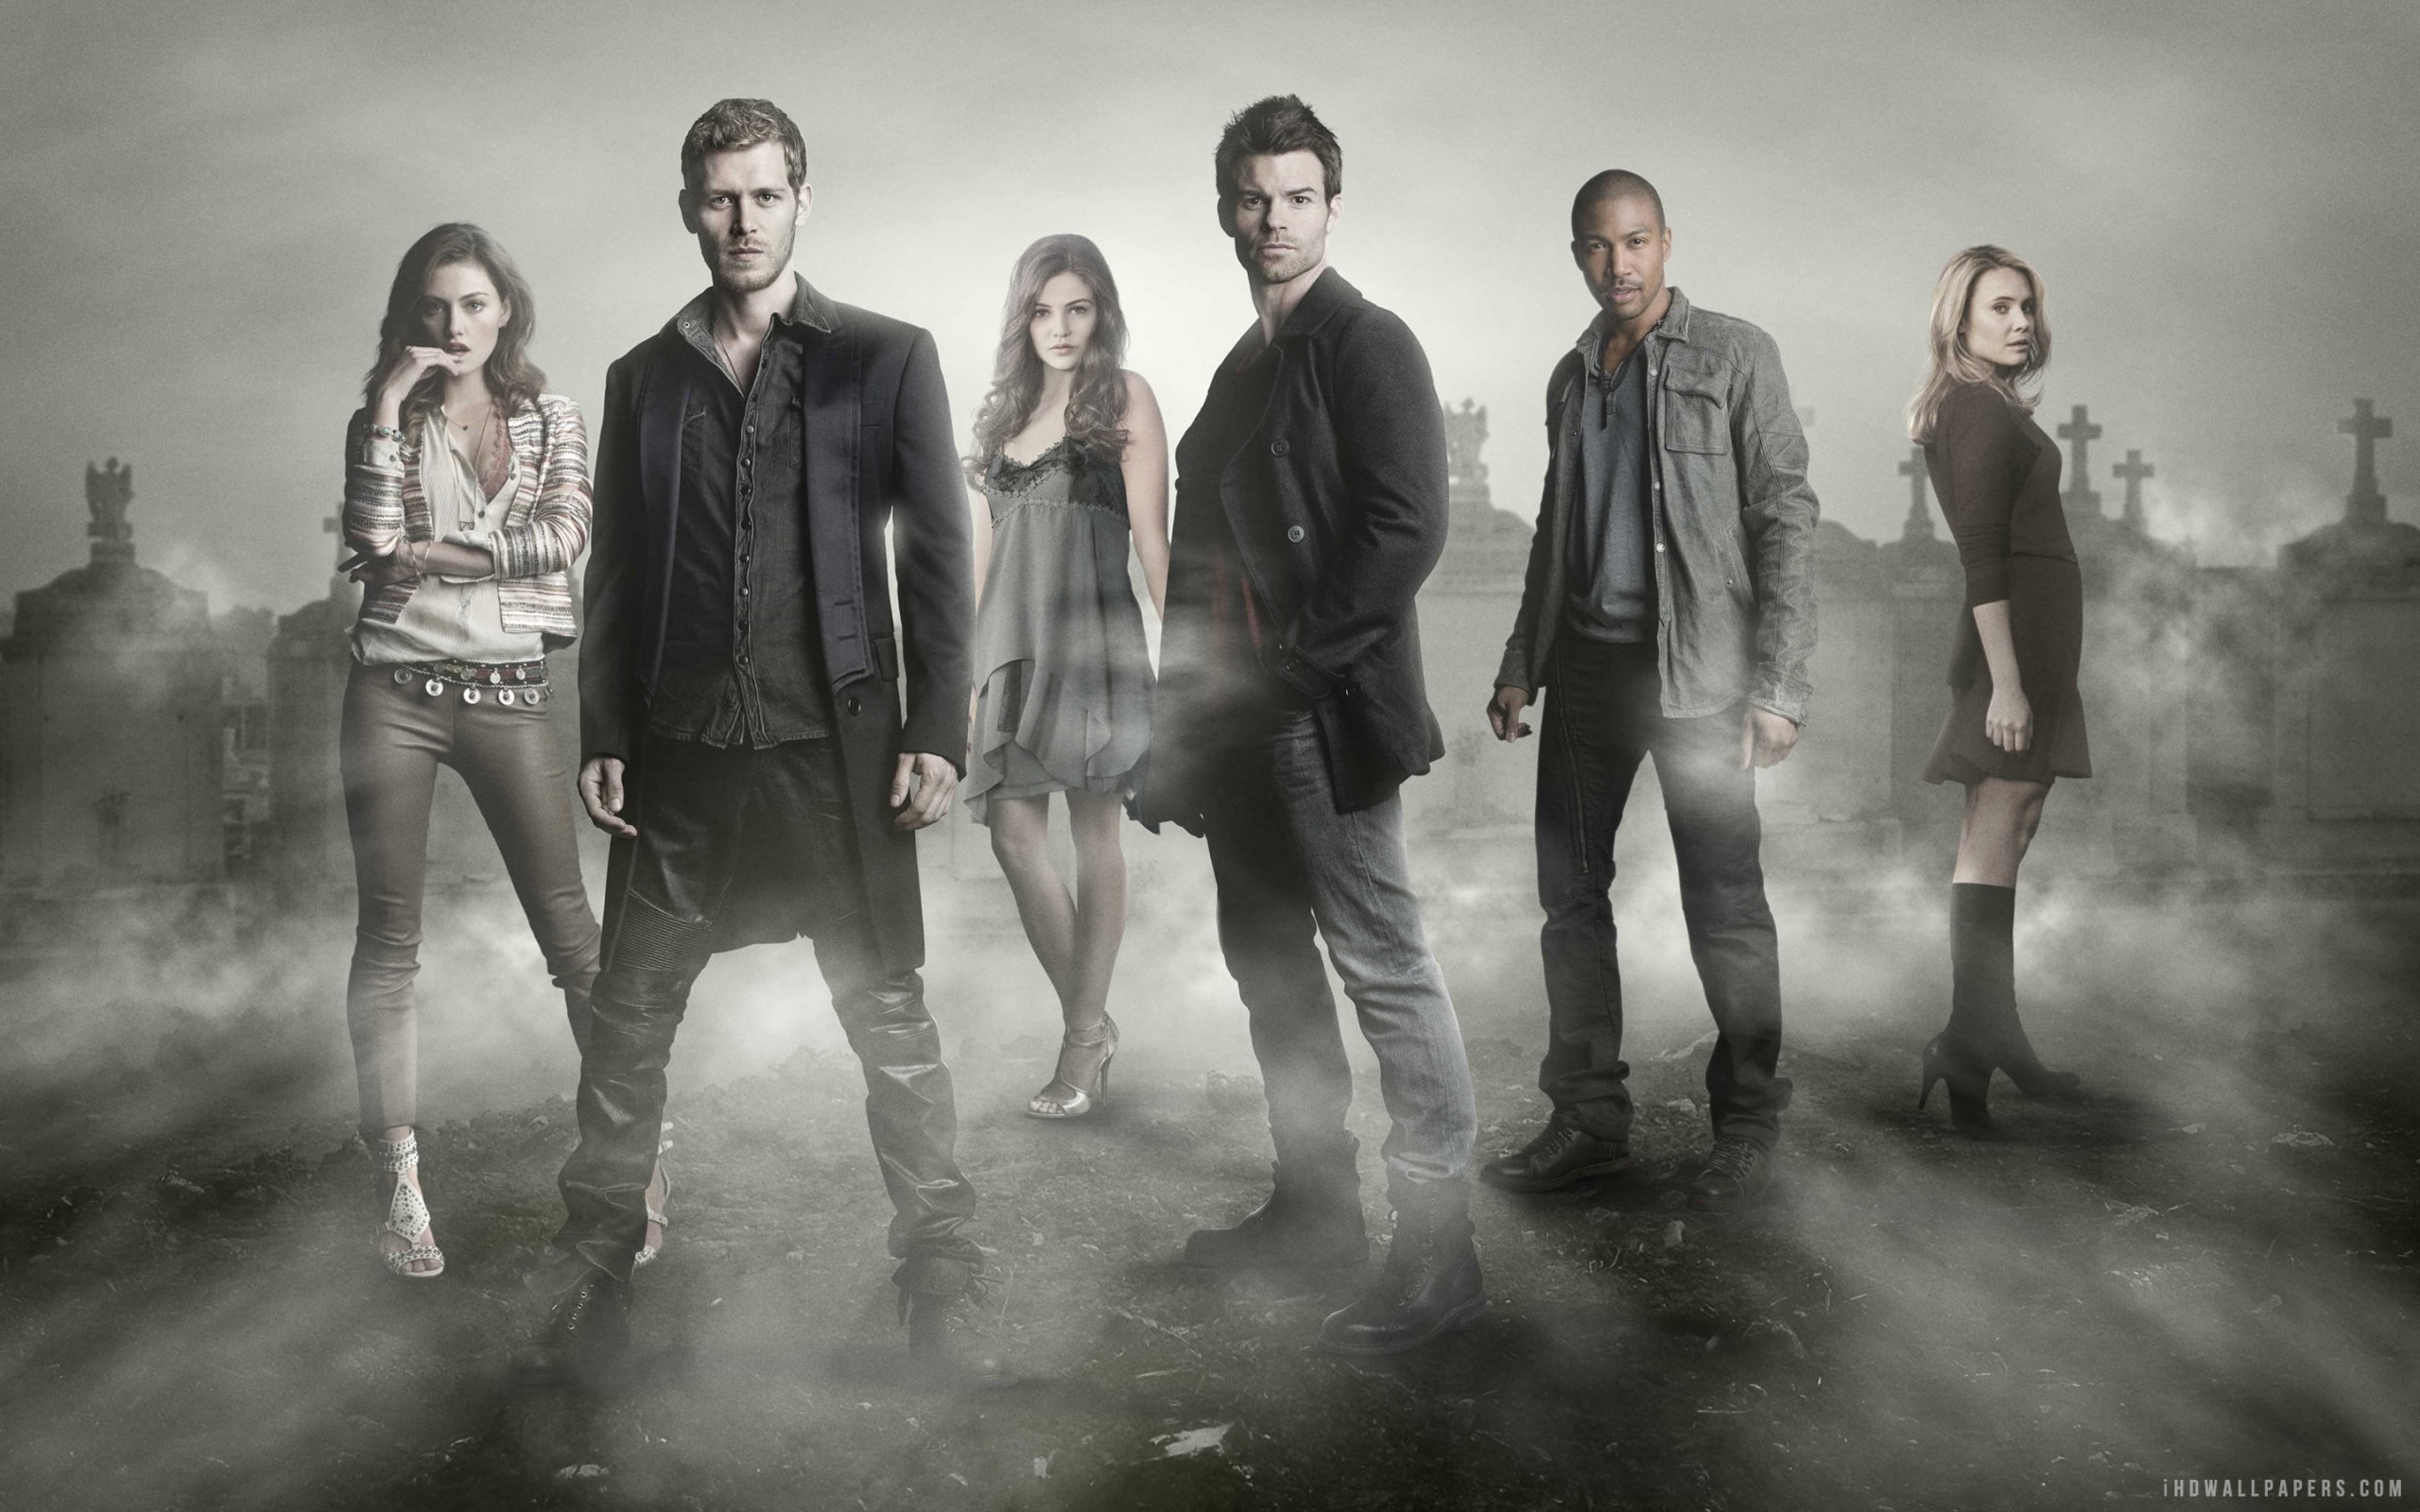 Free Download The Originals Season 2 2014 Hd Wallpaper Ihd